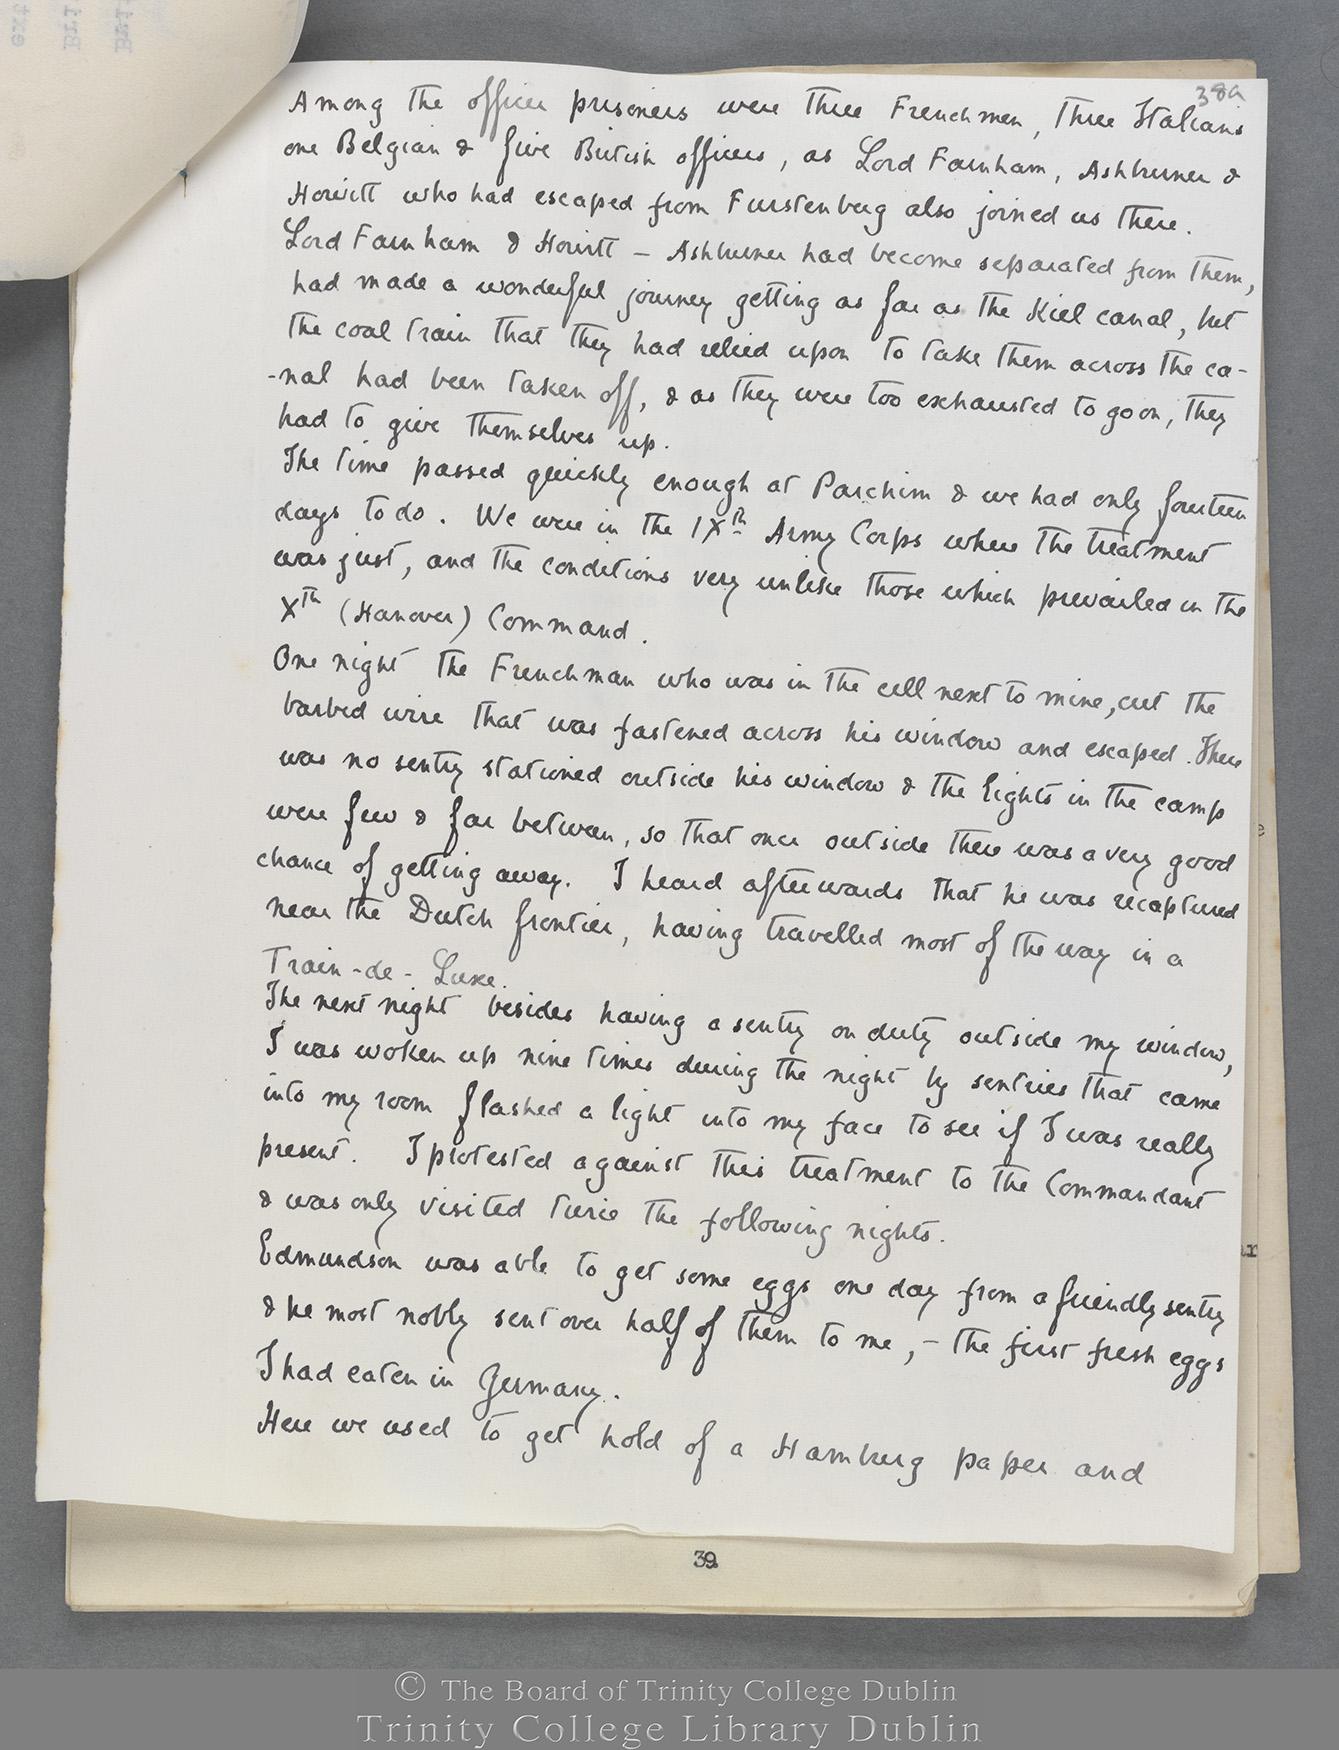 TCD MS 10823 folio 38a recto